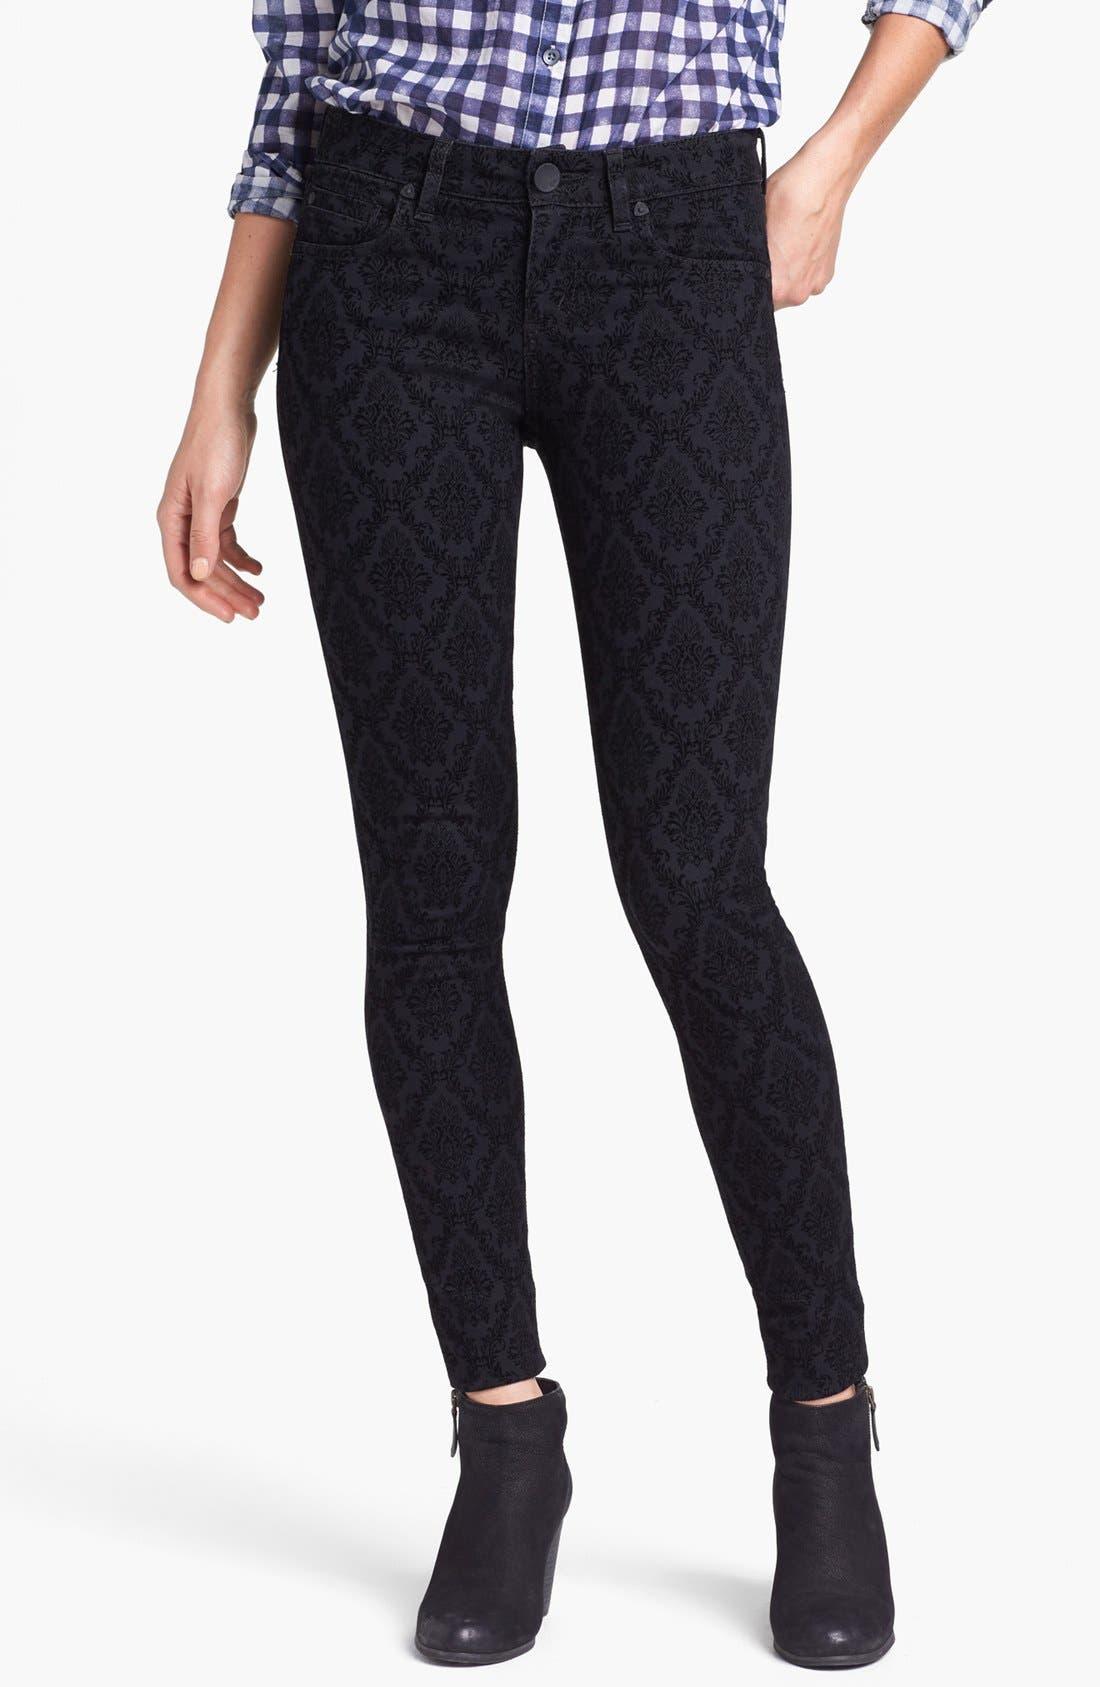 Alternate Image 1 Selected - KUT from the Kloth Print Skinny Jeans (Black Brocade Print)